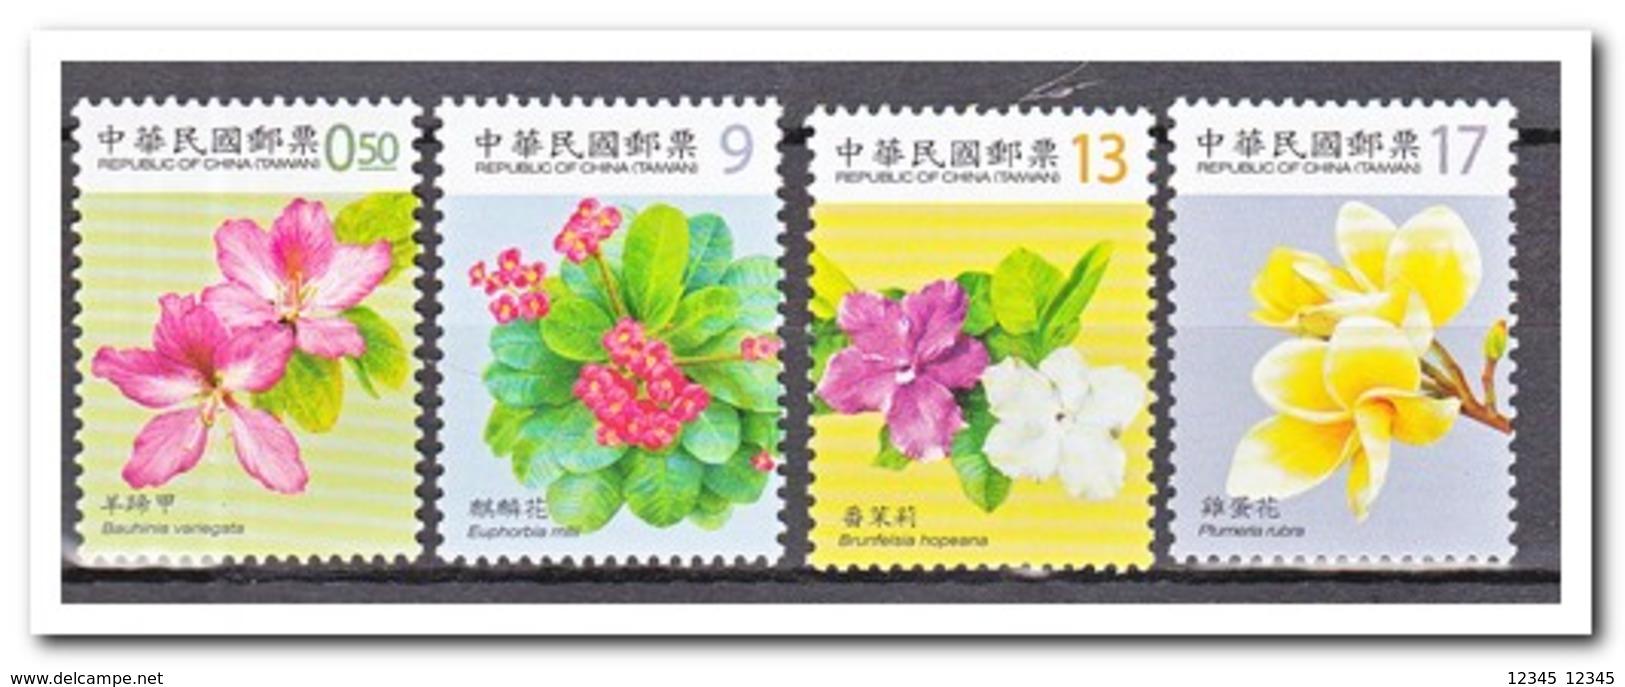 Taiwan 2010, Postfris MNH, Flowers - 1945-... Republiek China